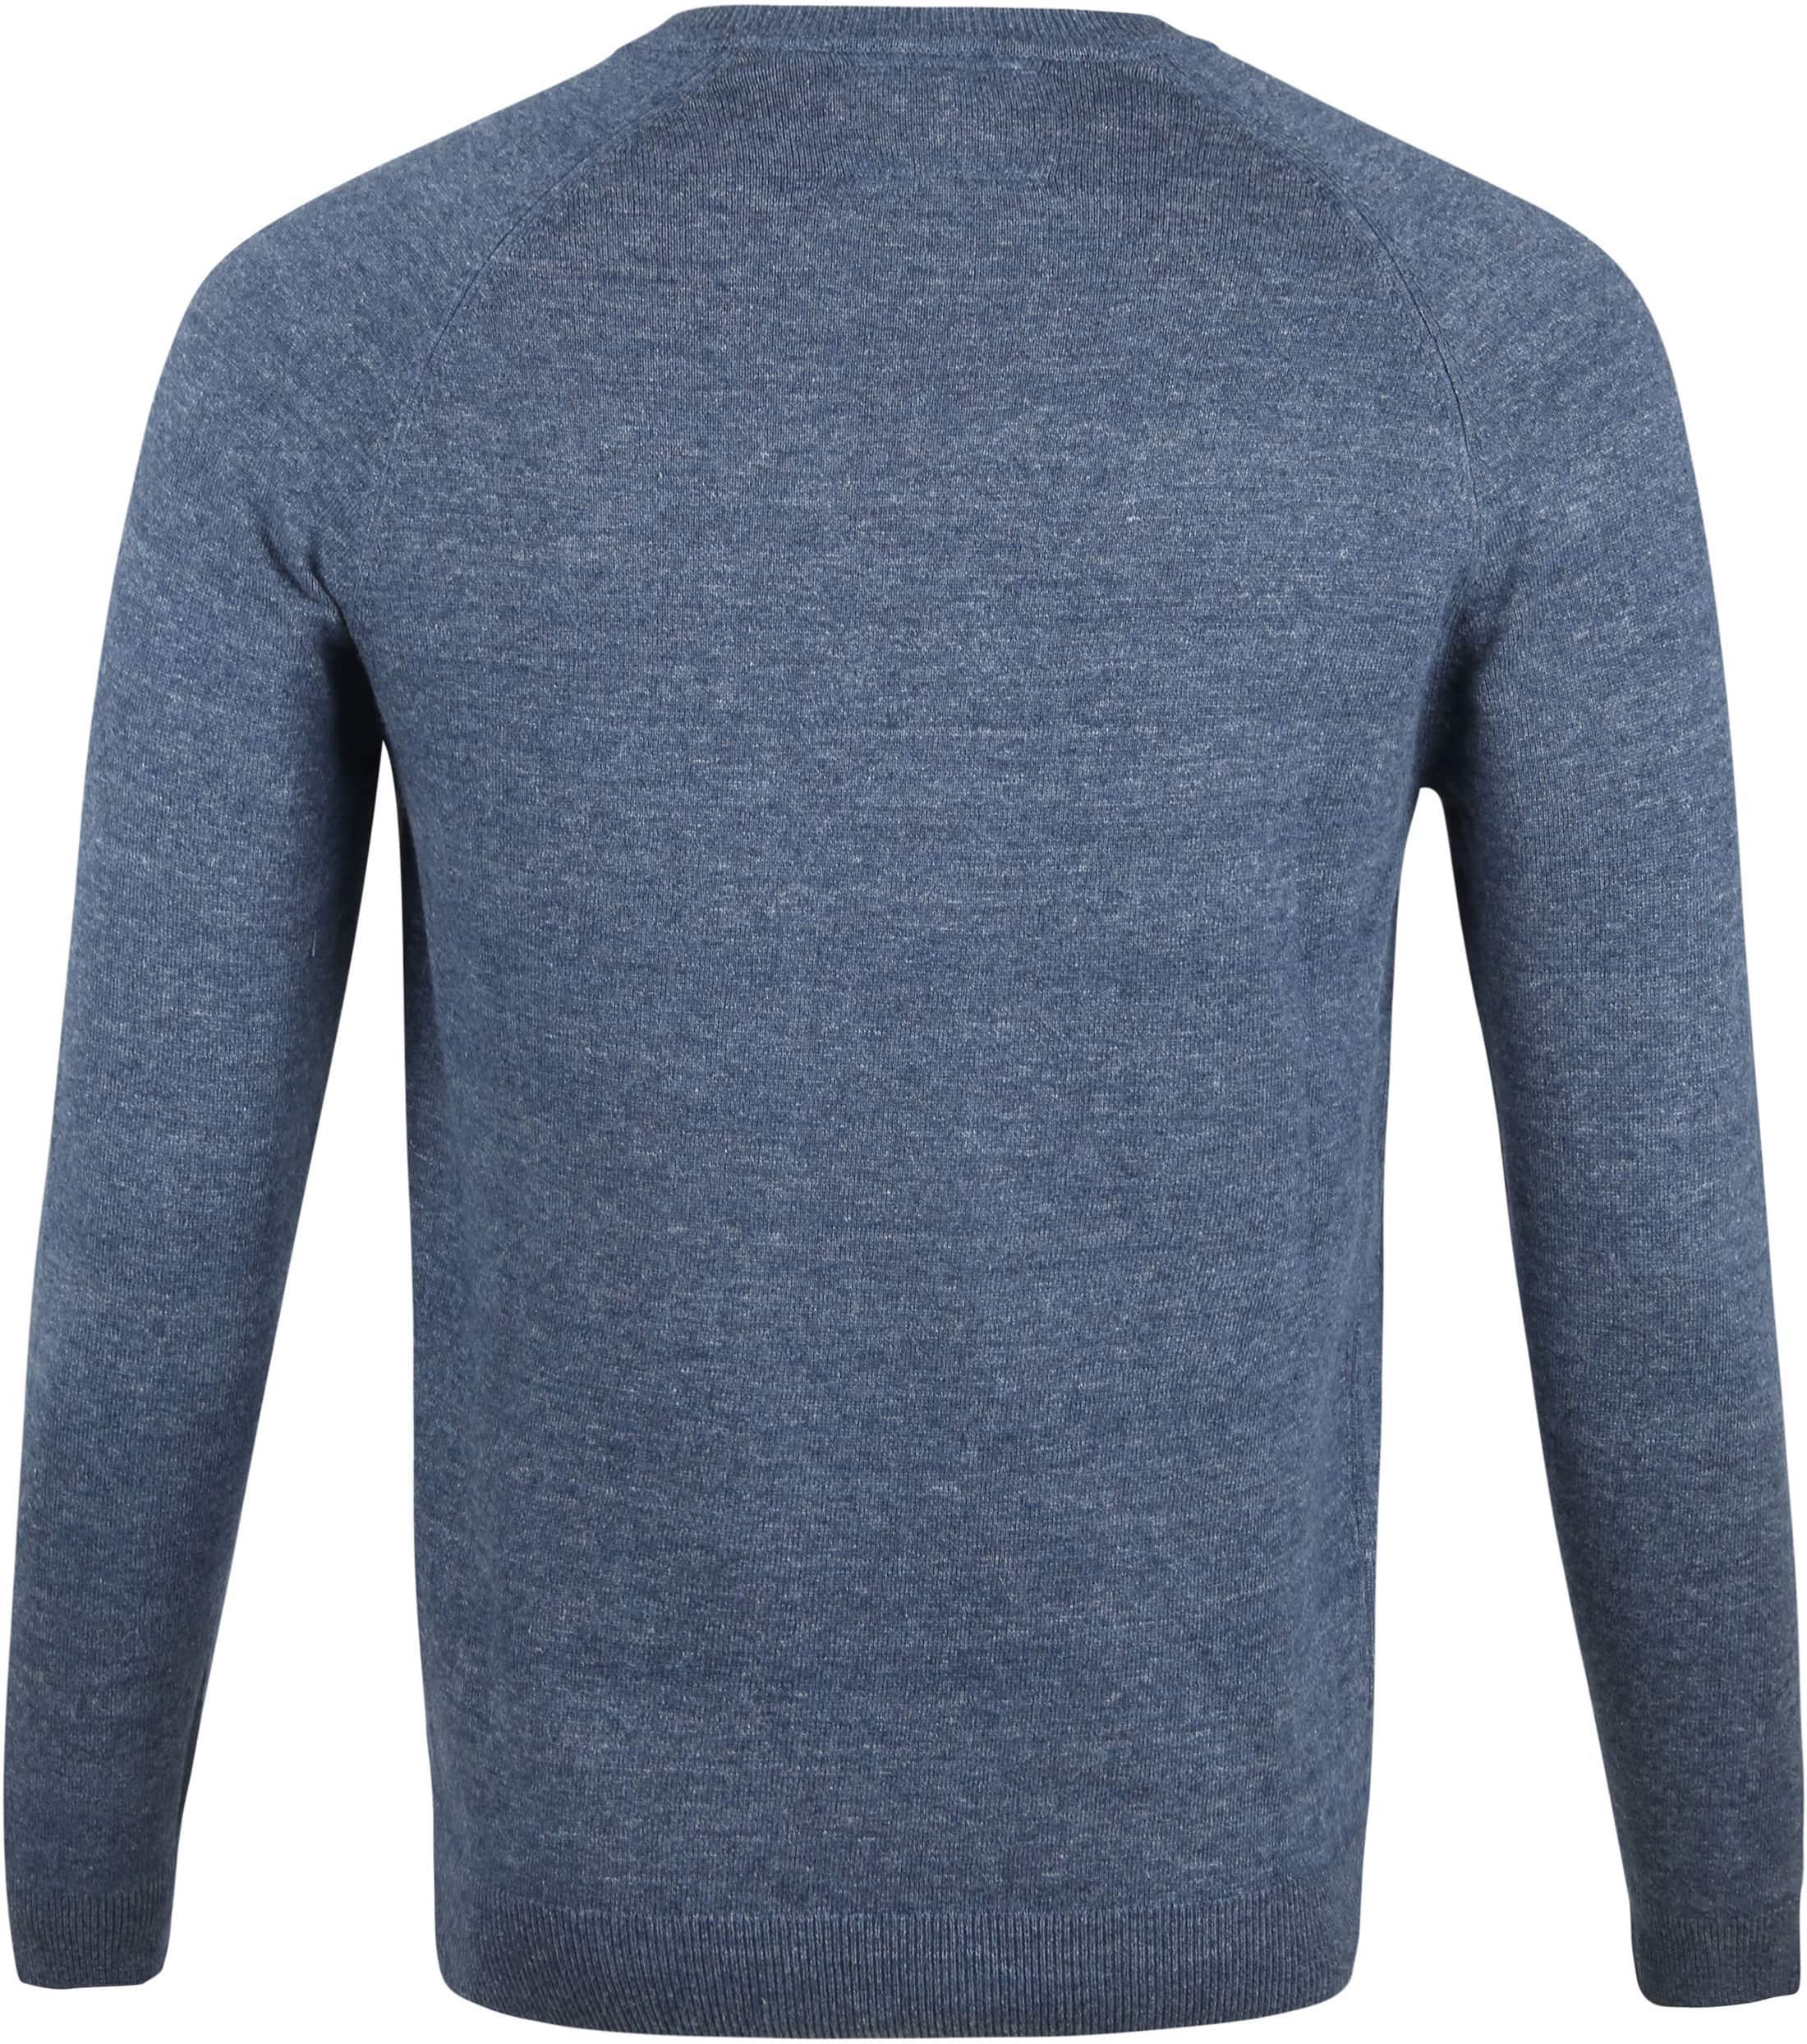 Superdry Pullover Blauw foto 3